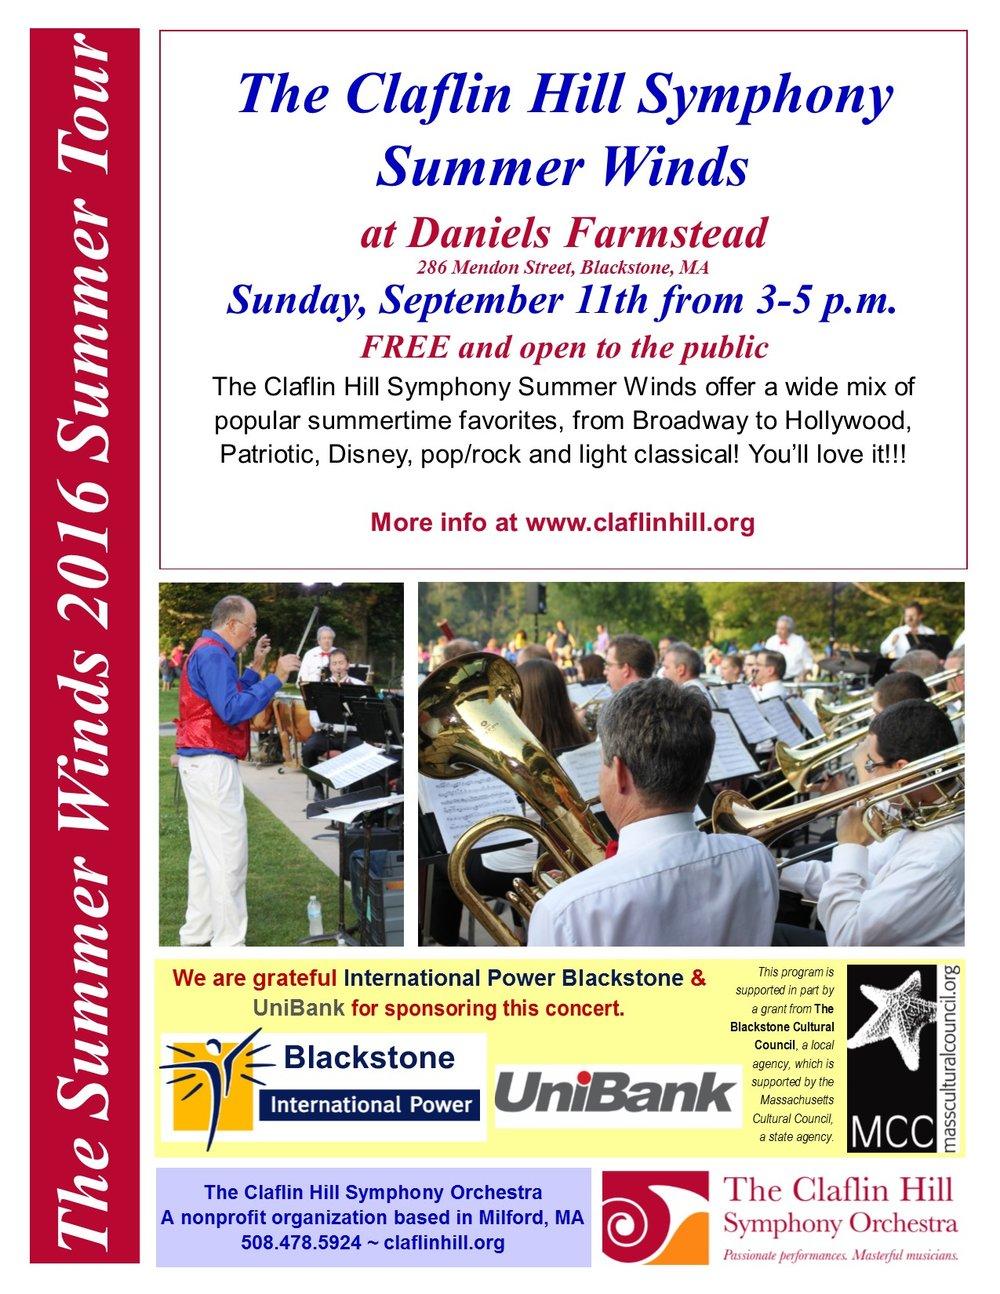 Summer Winds at Daniels Farmstead flyer 2016.jpg